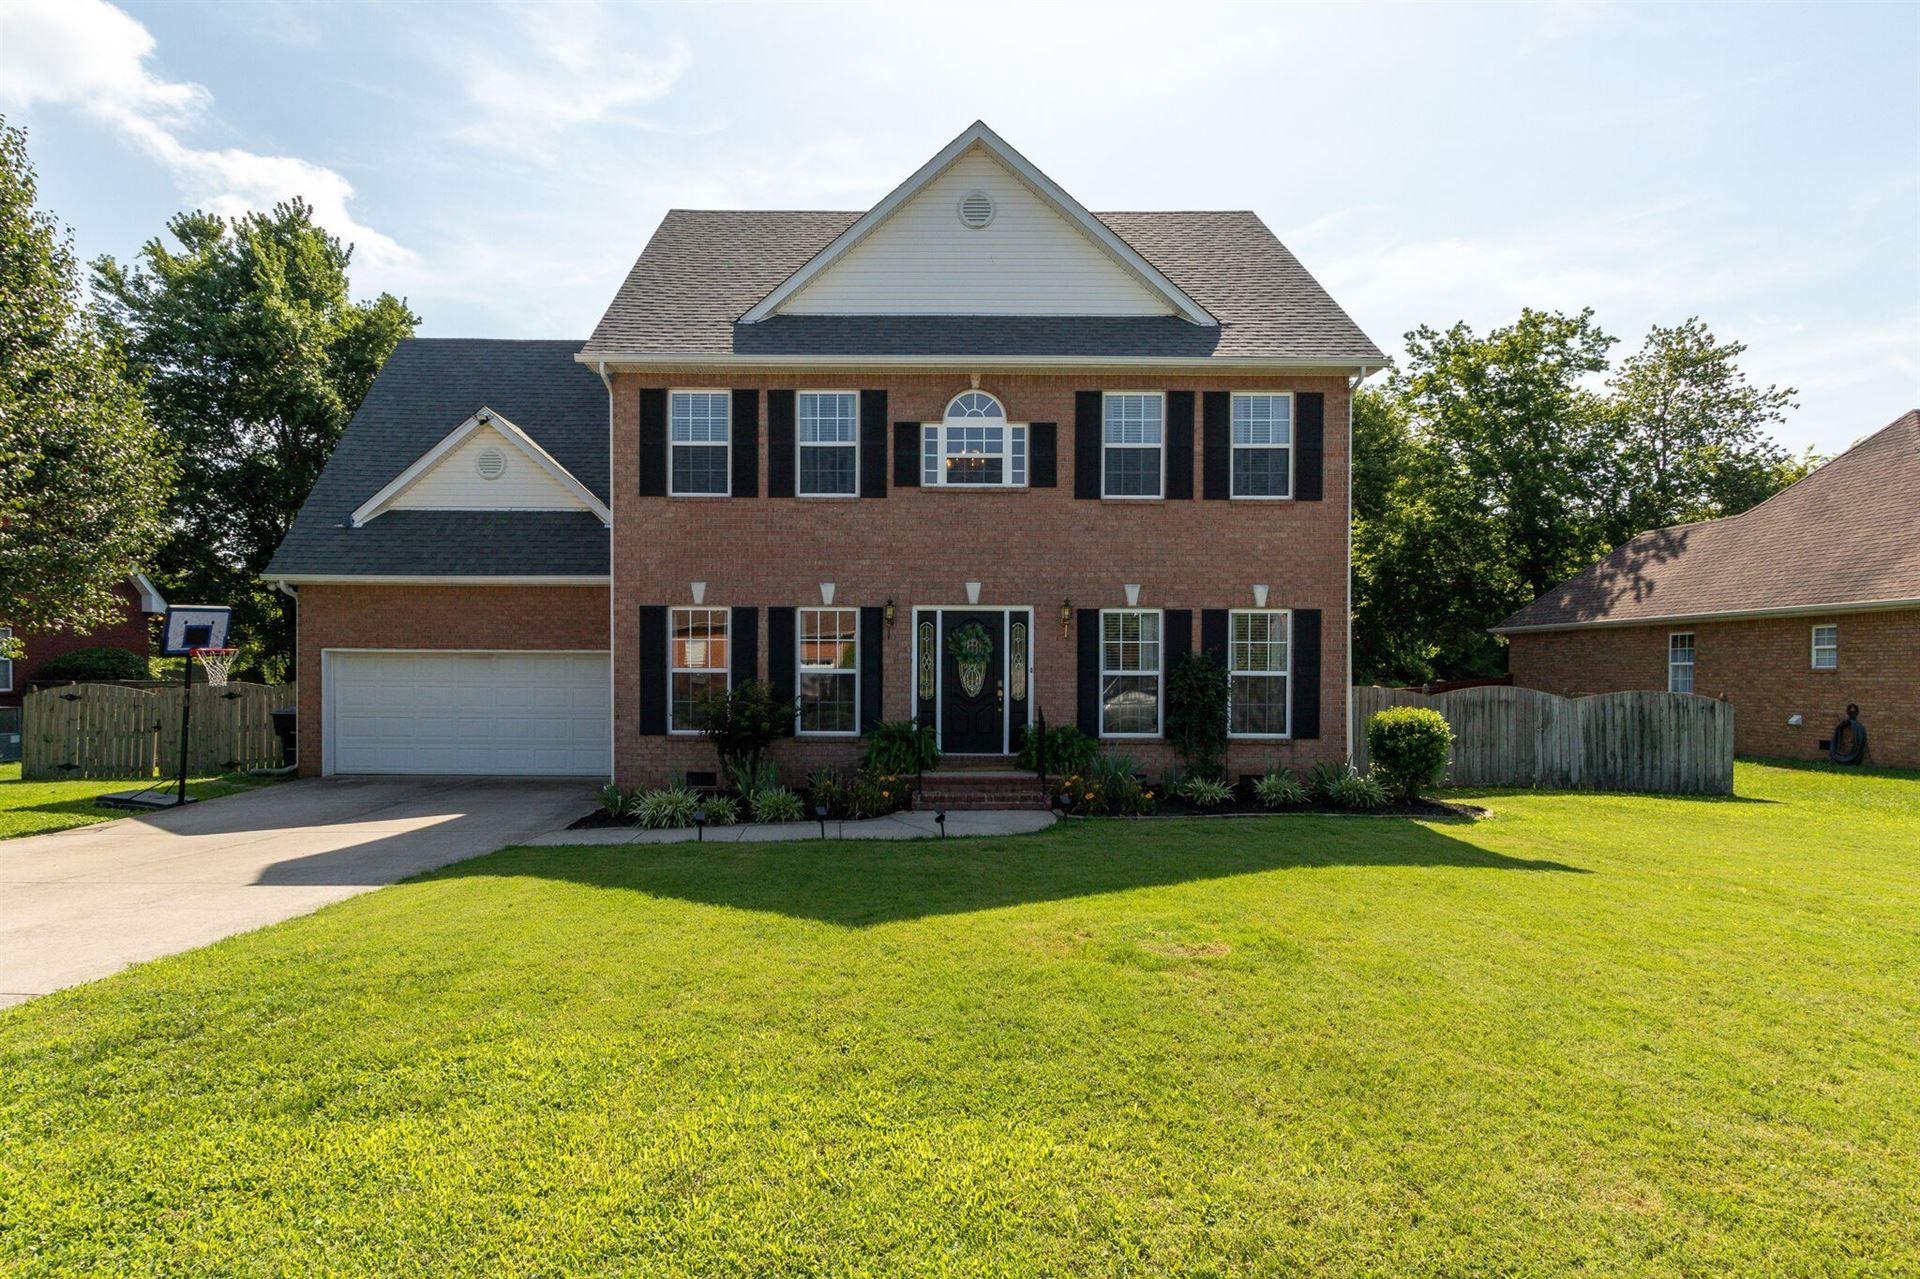 2835 Comer Drive, Murfreesboro, TN 37128 - MLS#: 2274570